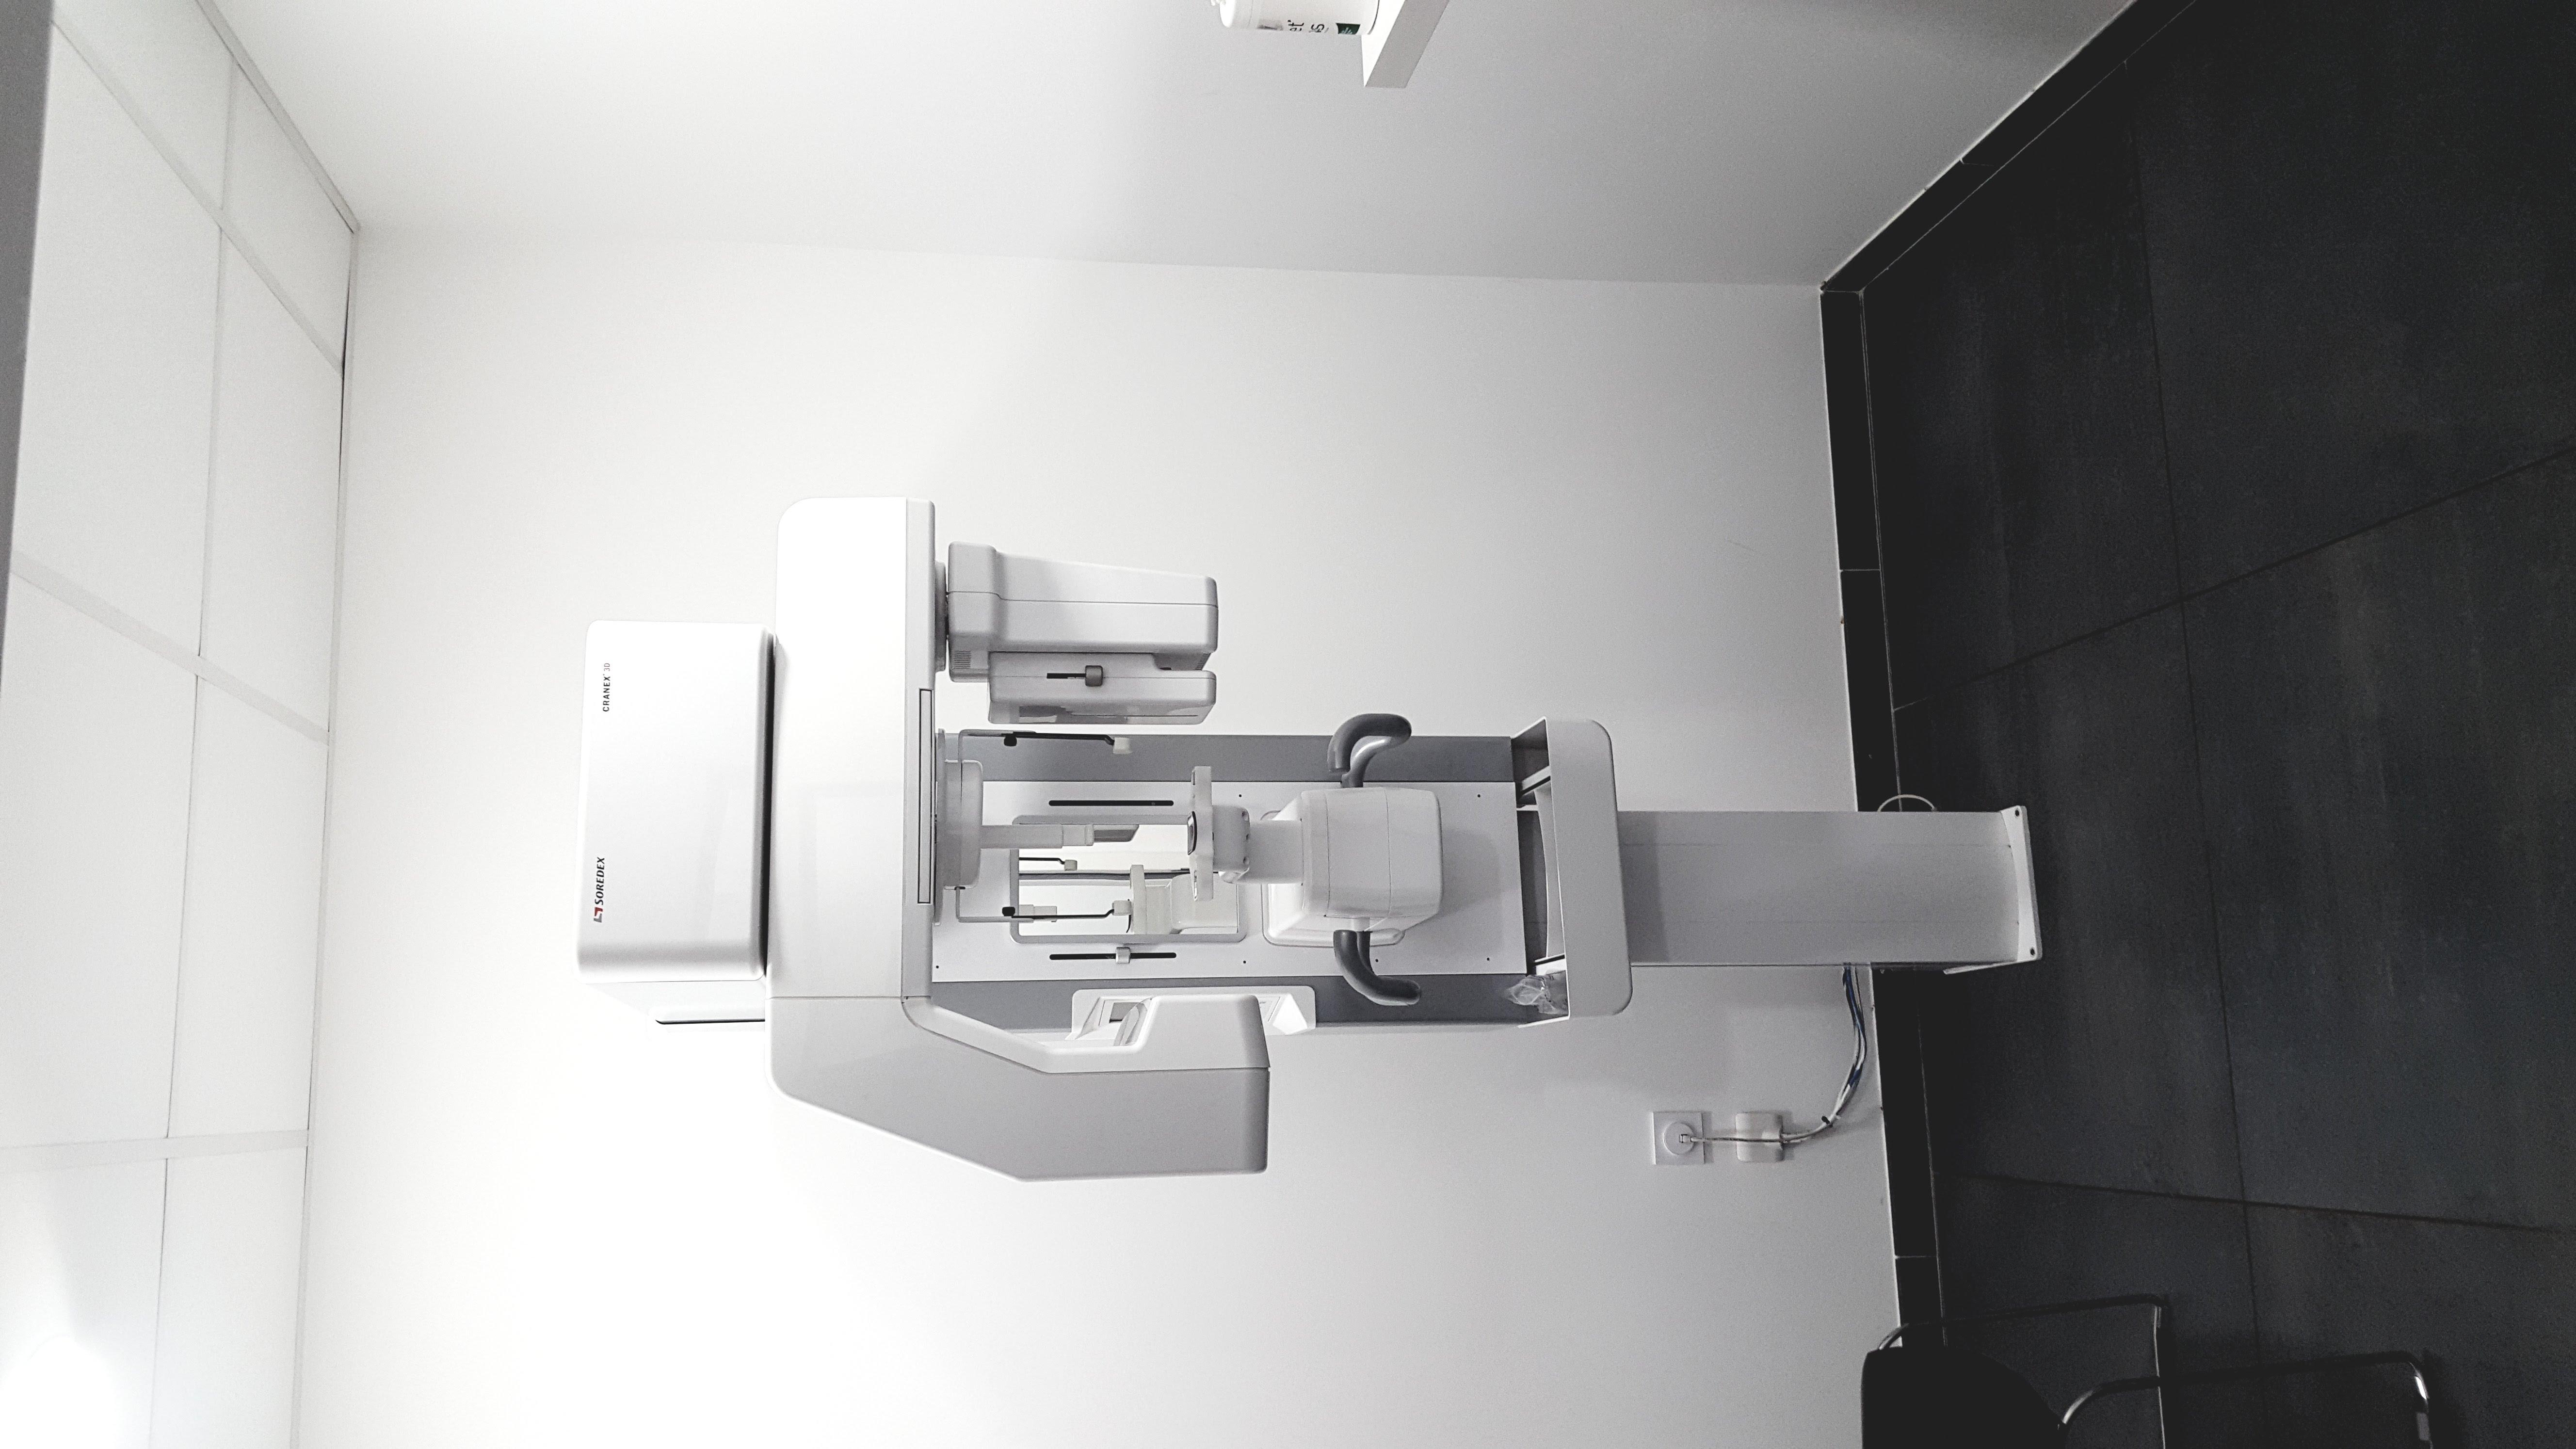 Scanner CONE BEAM 3D